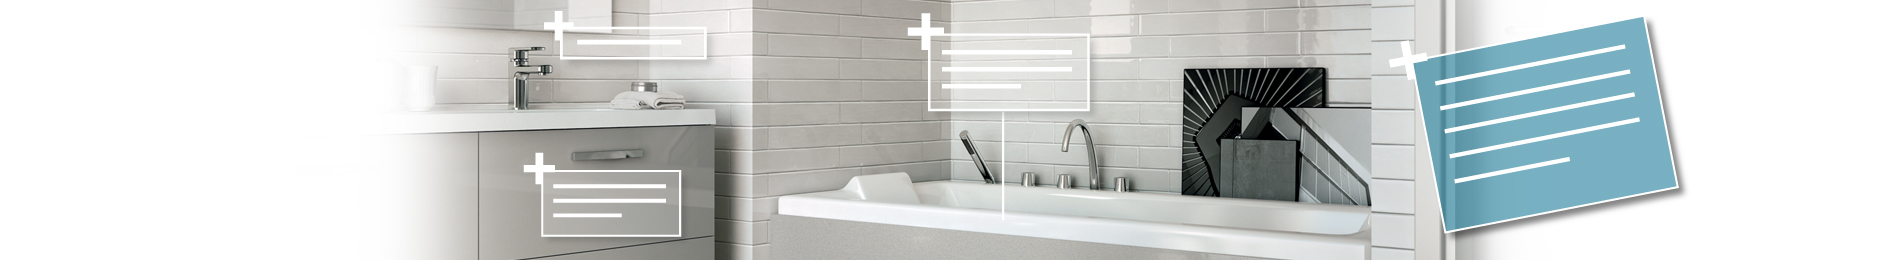 Equipements de salle de bain for Equipement de salle de bain